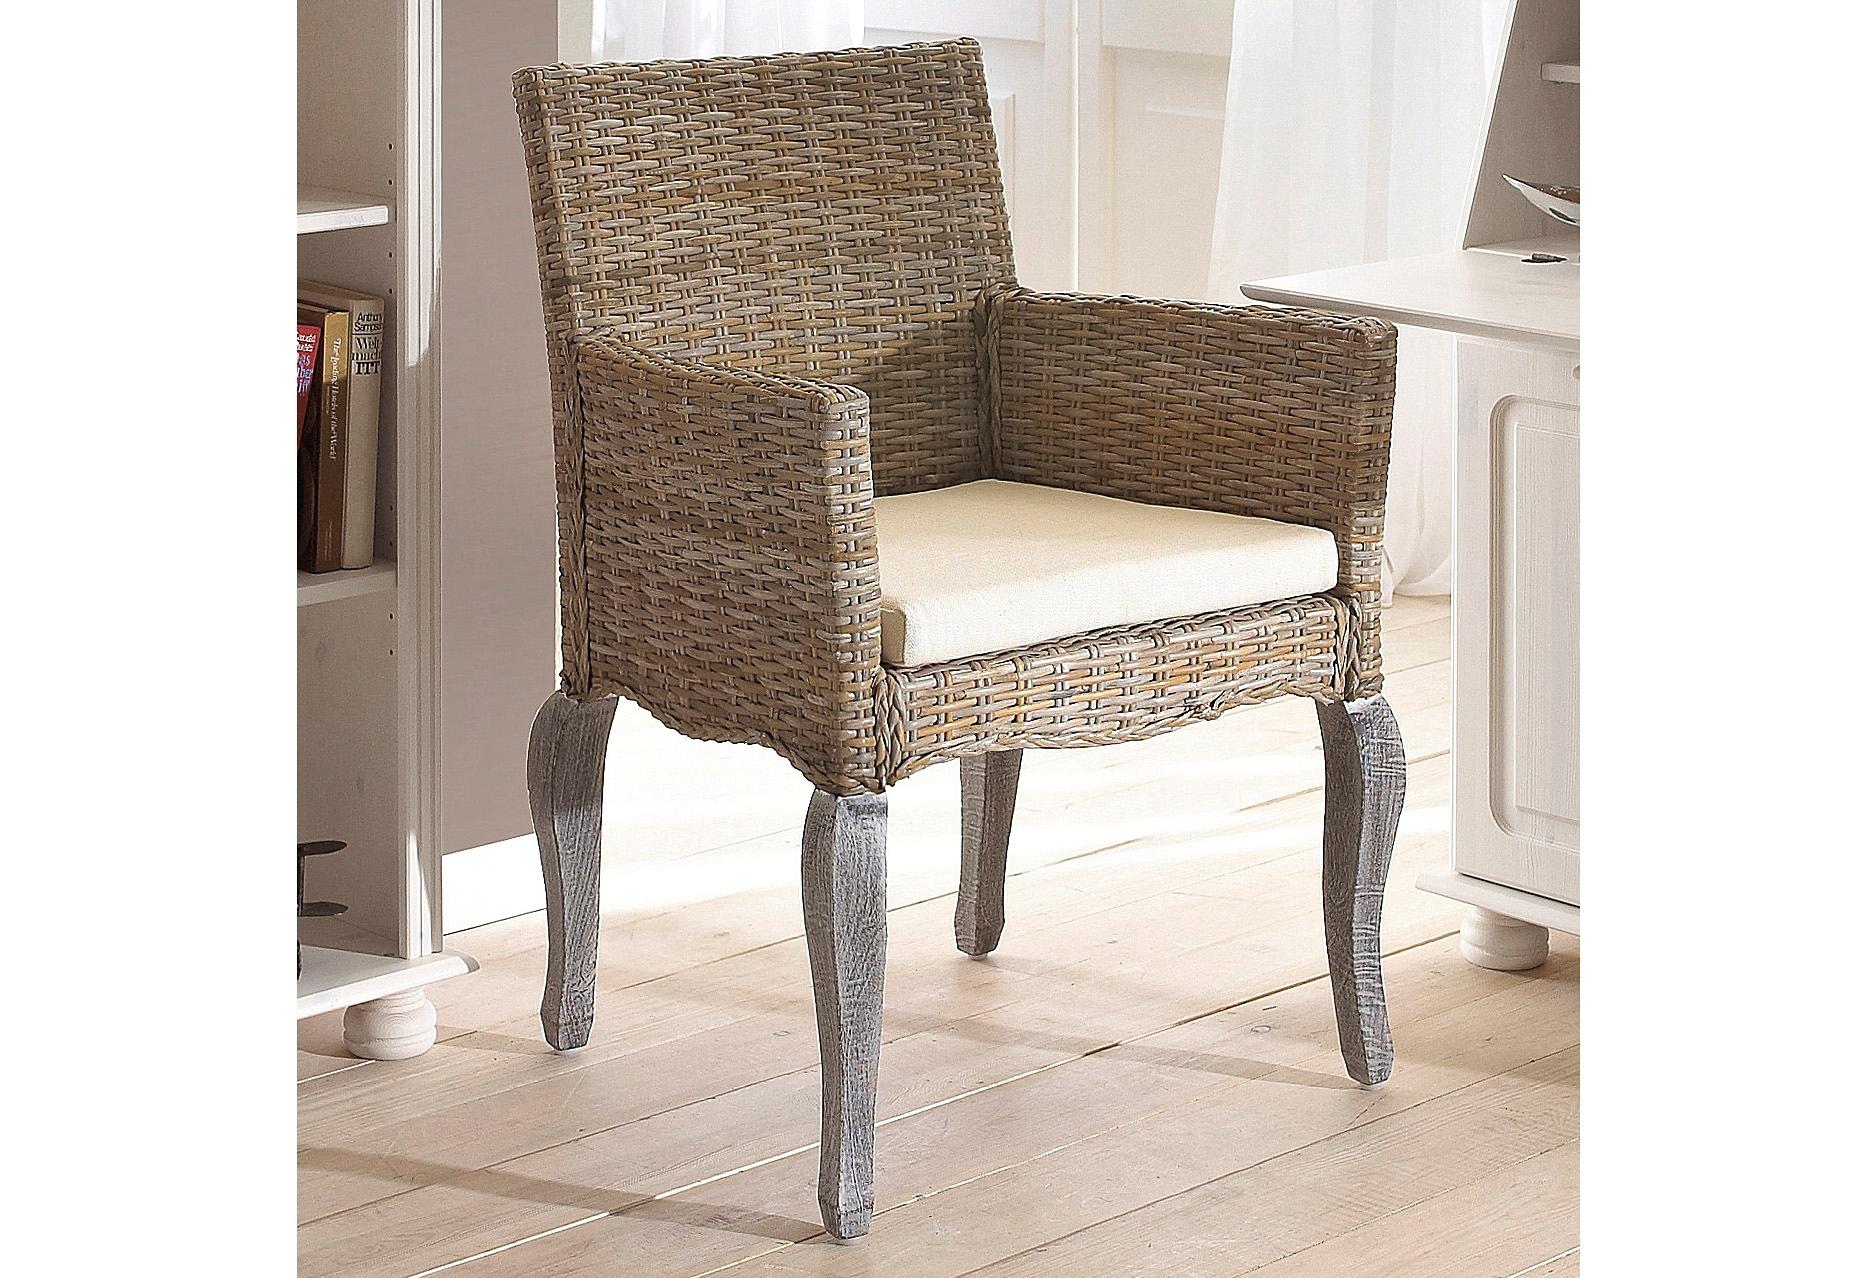 fauteuil home affaire in de online winkel otto. Black Bedroom Furniture Sets. Home Design Ideas